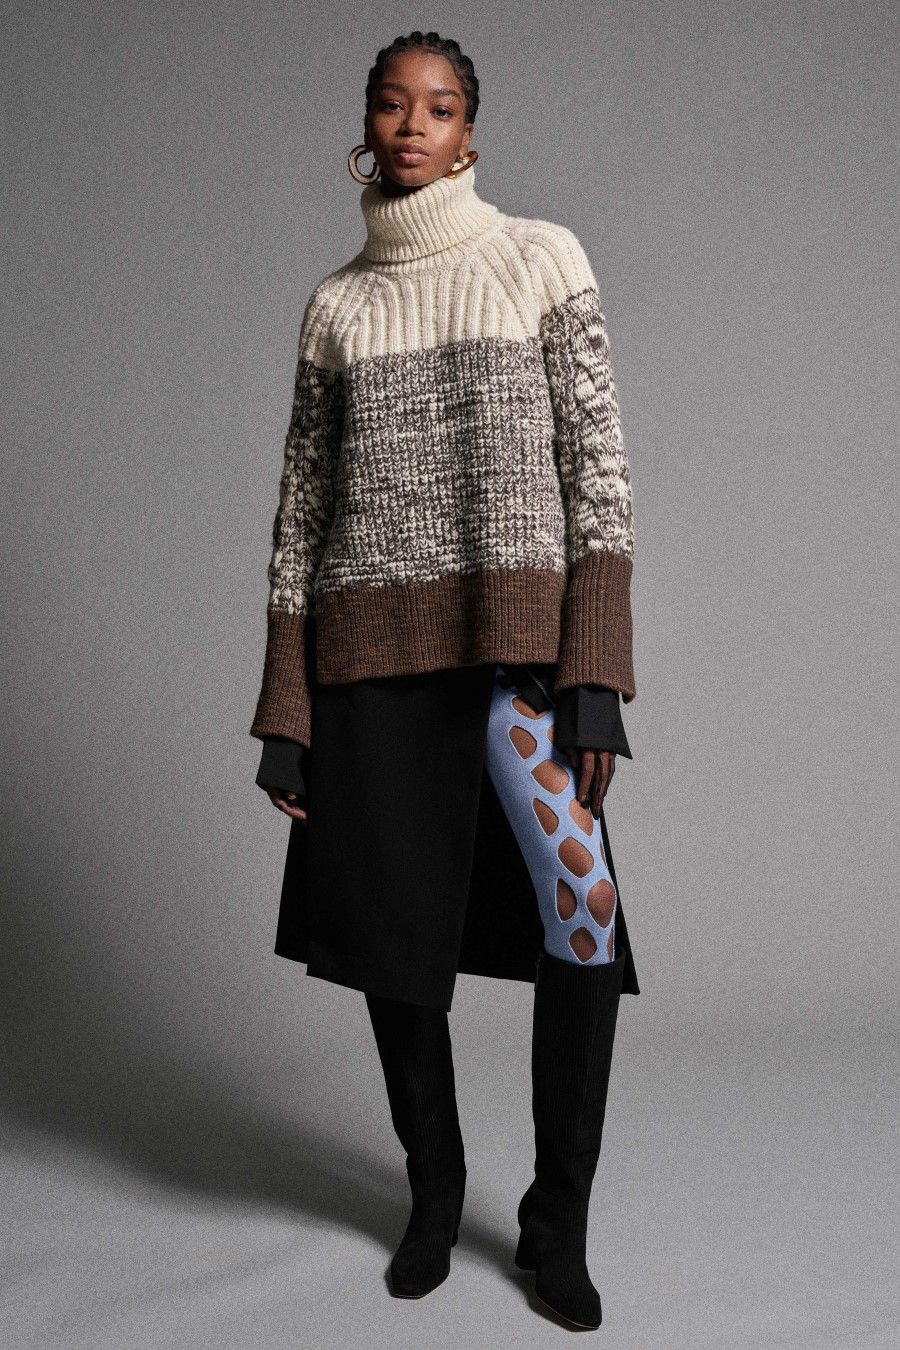 3.1 Phillip Lim Fall Winter 2021 - New York Fashion Week